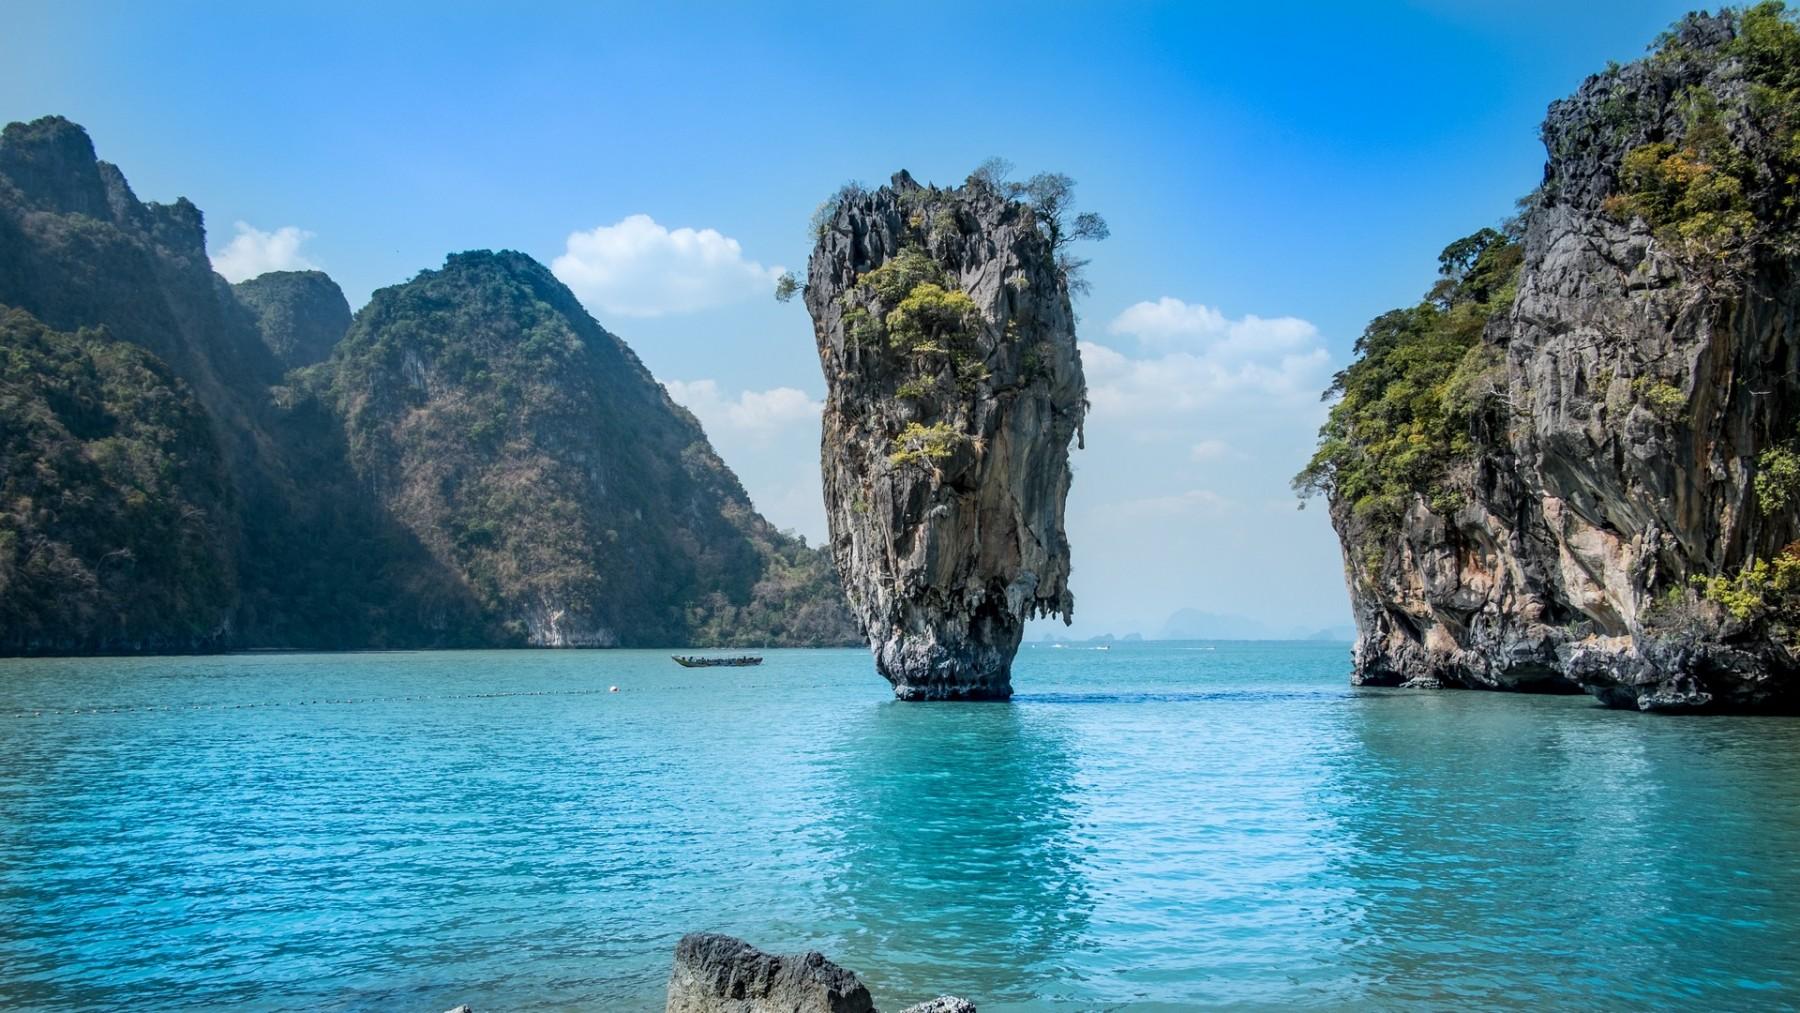 james bond island novotel phuket karon beach resort and spa. Black Bedroom Furniture Sets. Home Design Ideas